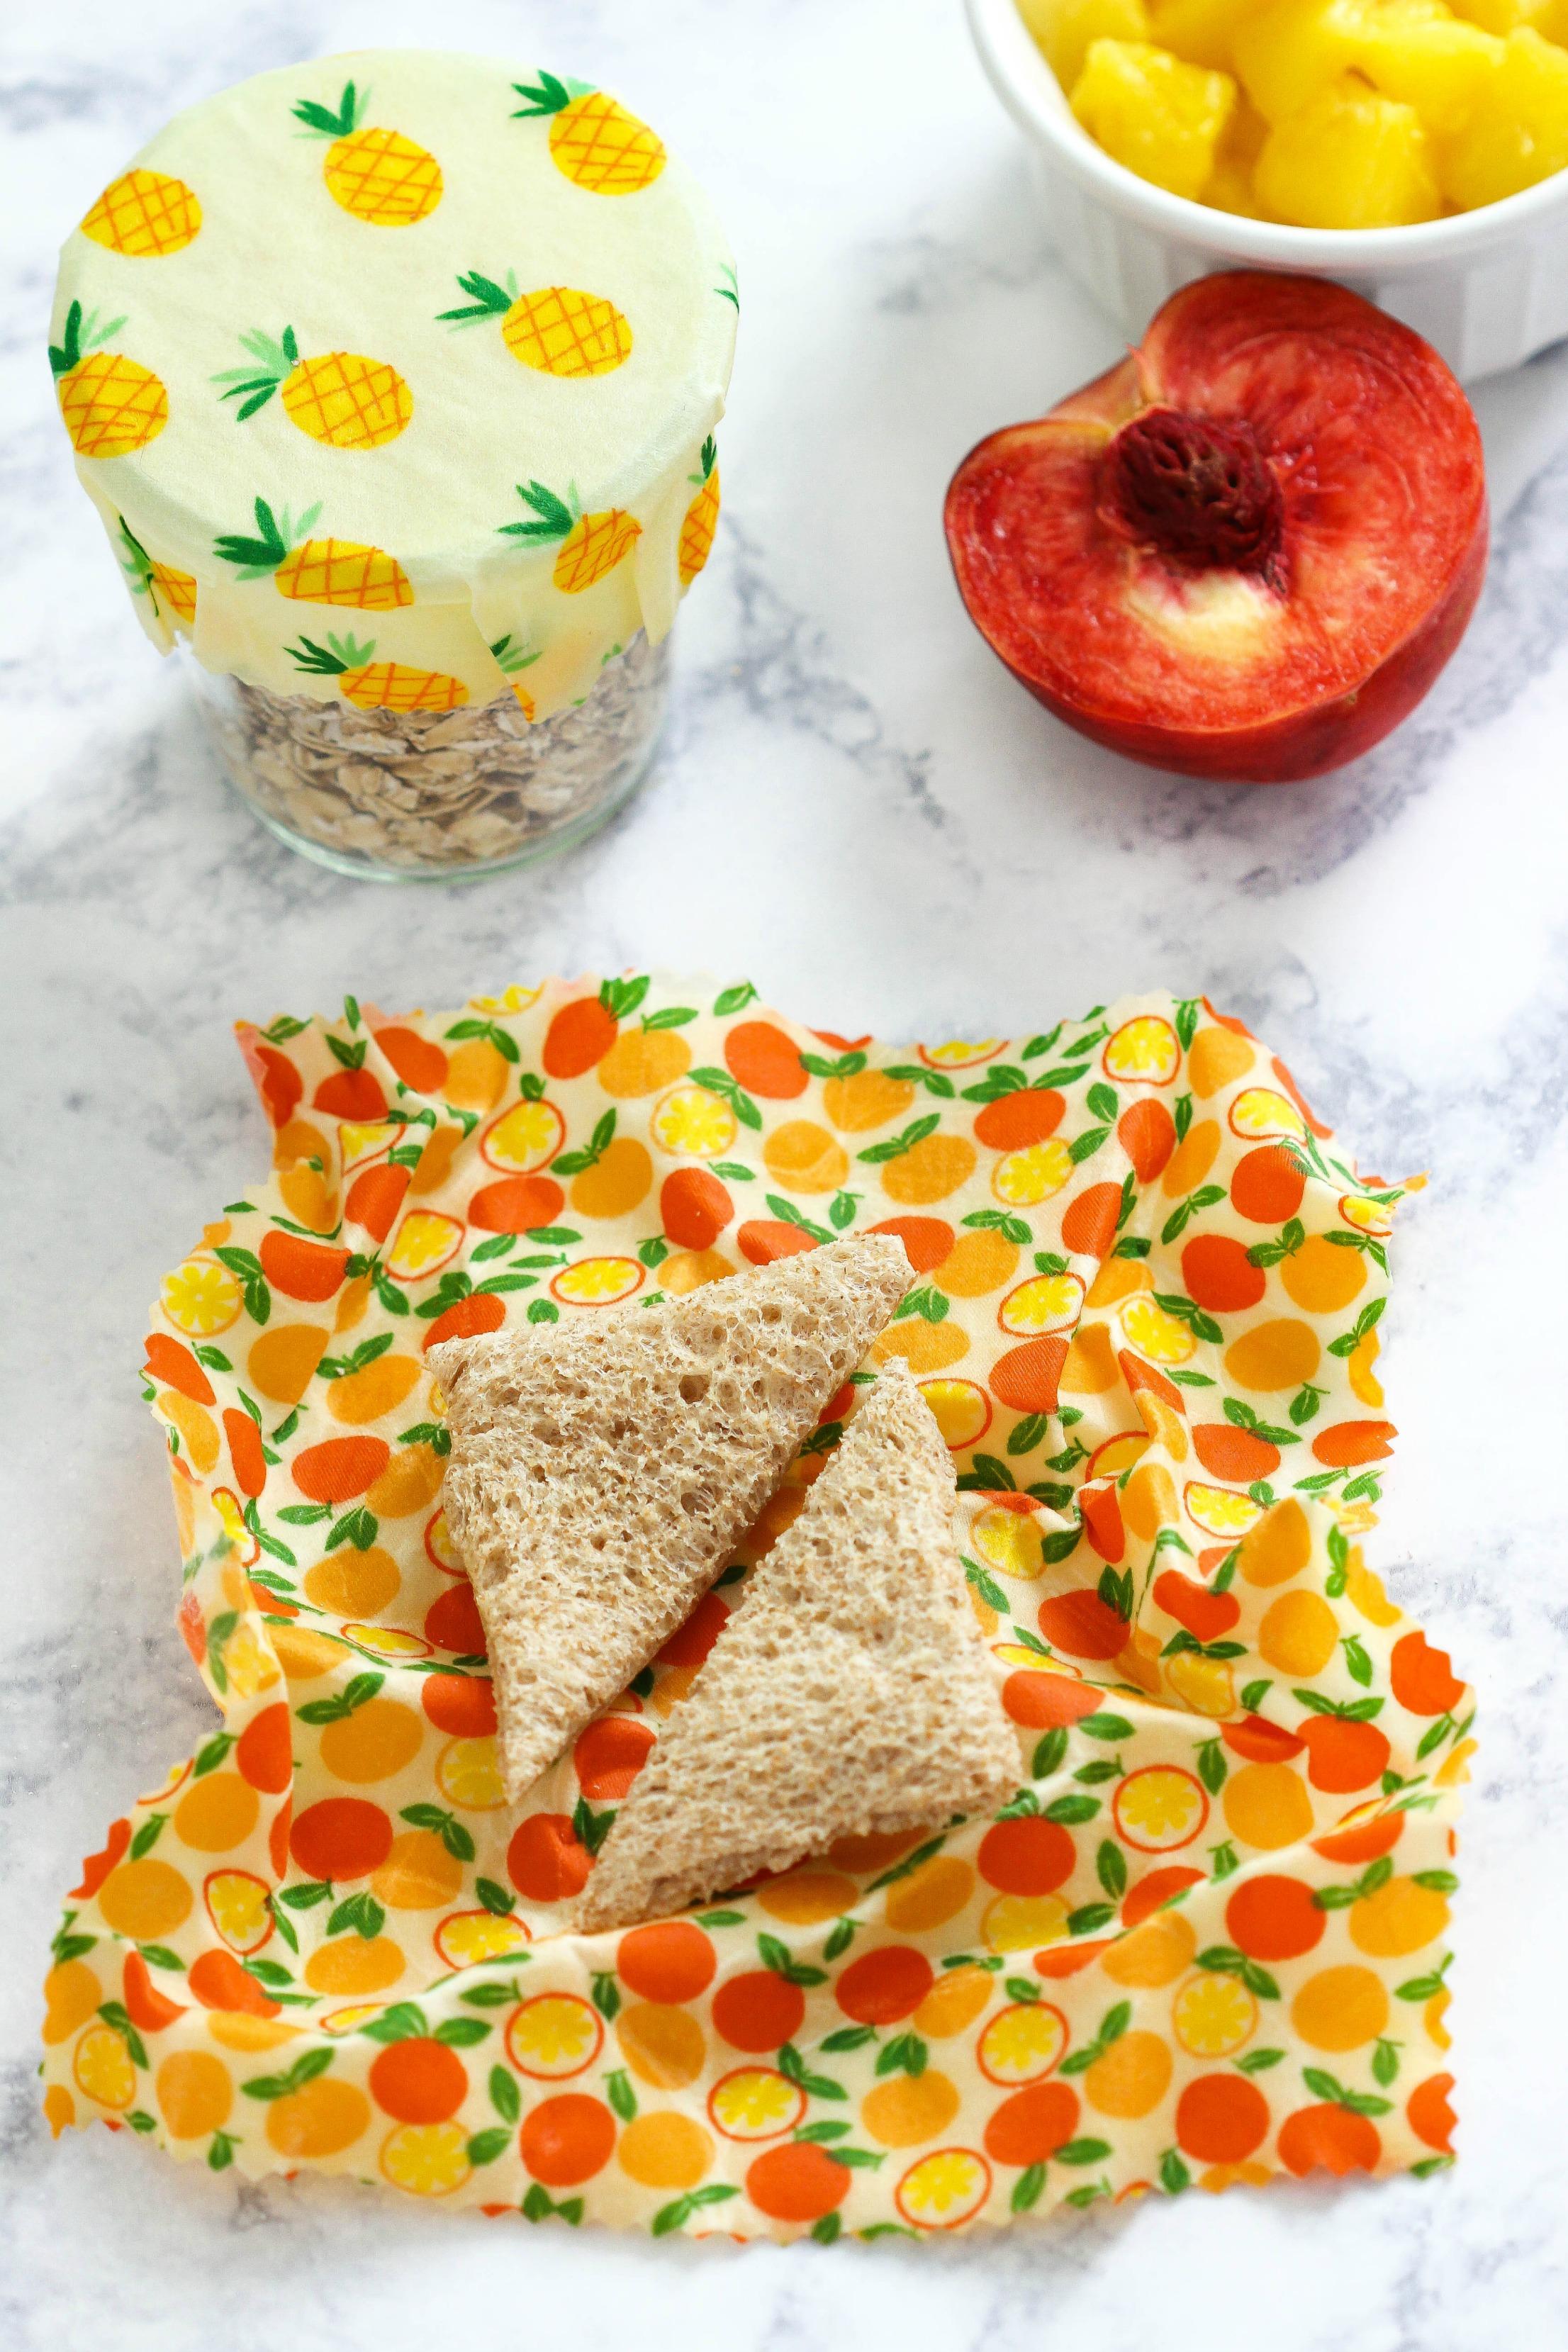 DIY beeswax fabric food wraps